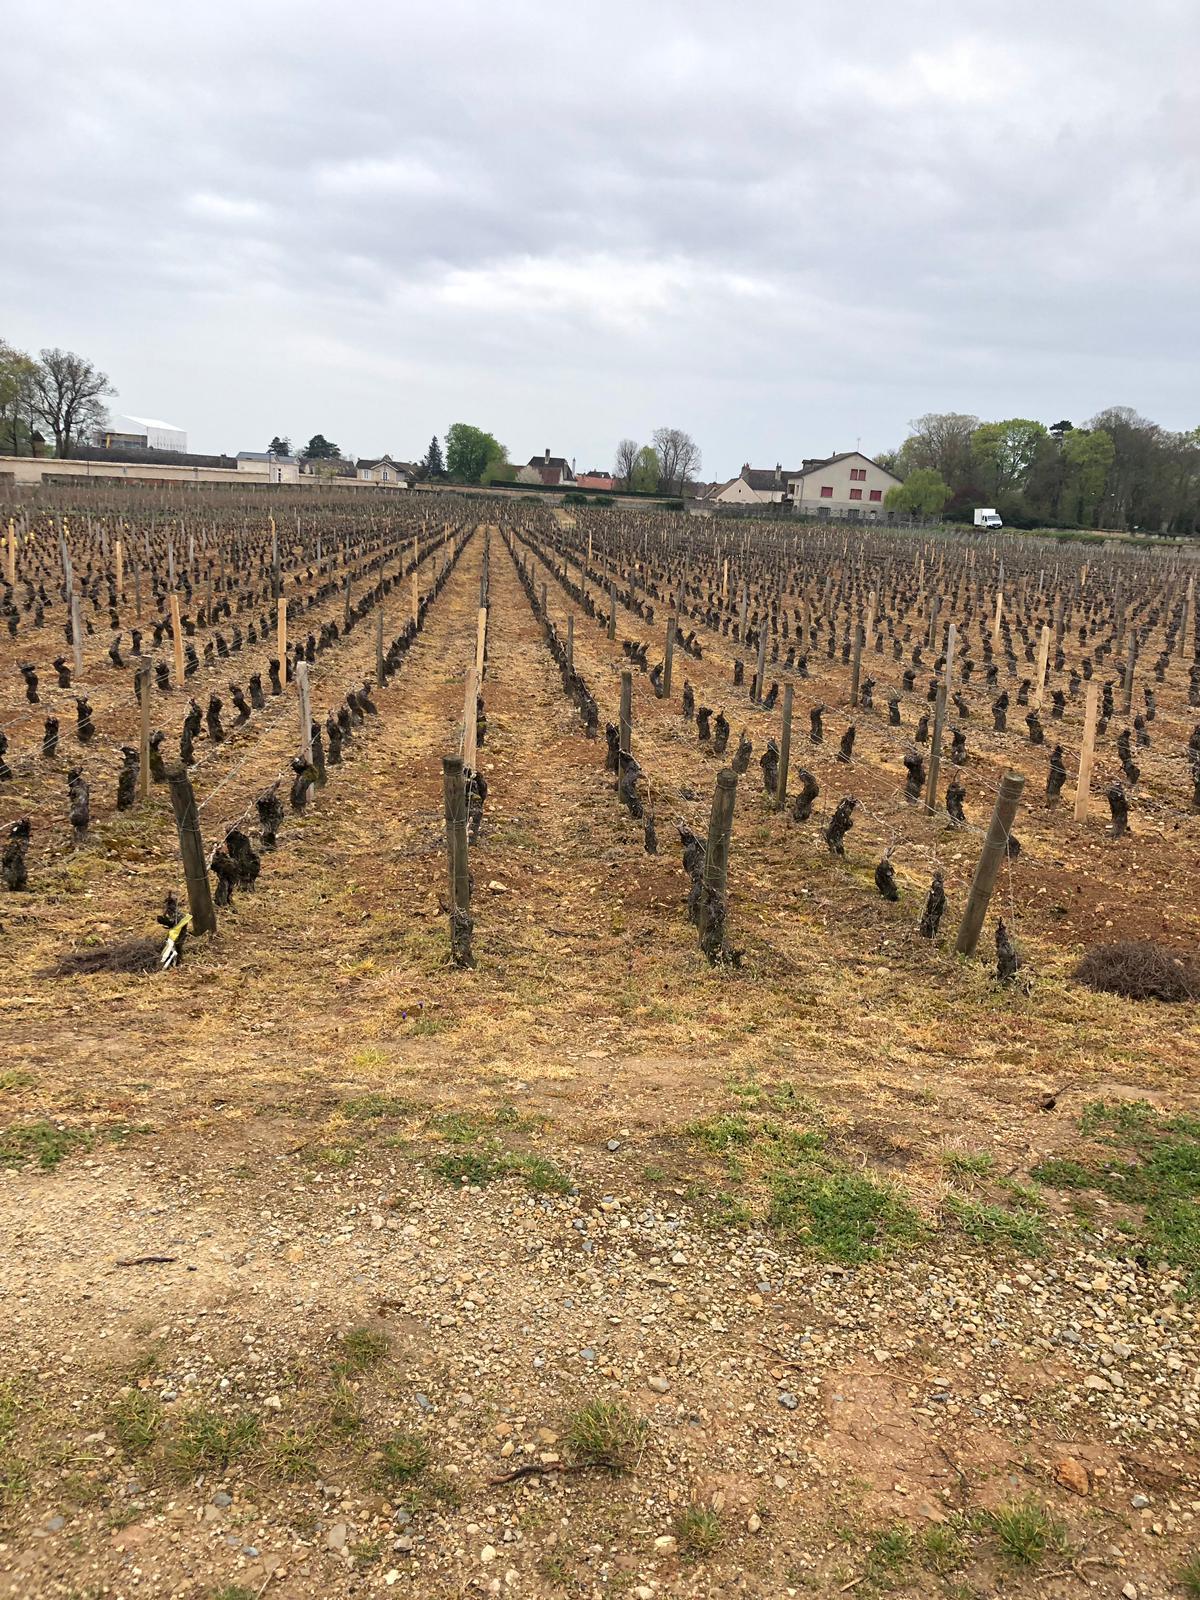 16-04-2019: A vineyard in Pommard with Glyfosate (Roundup)